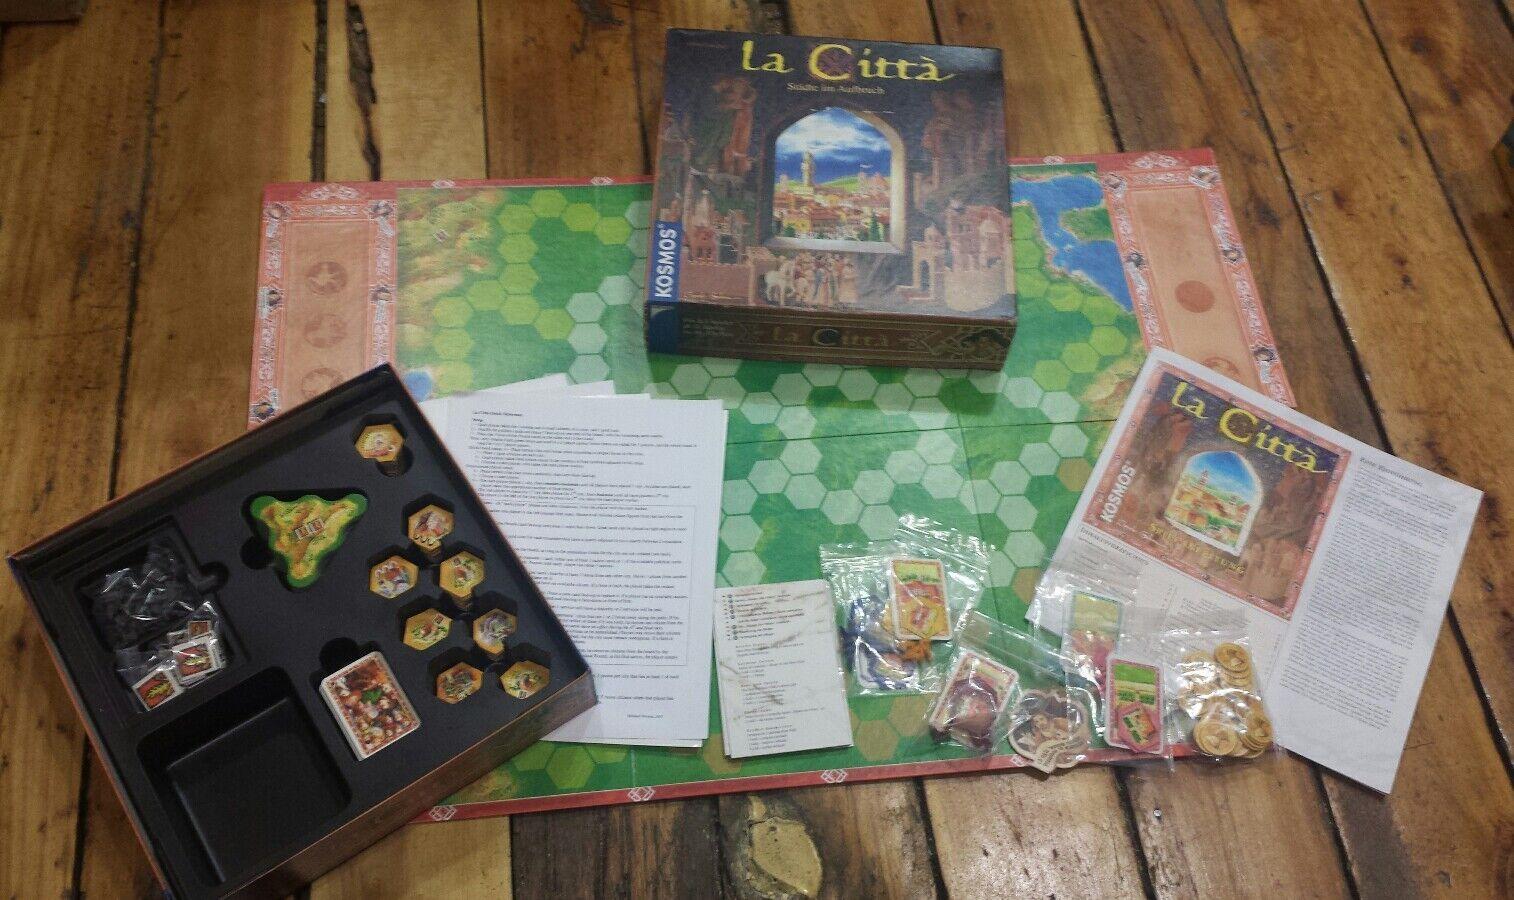 La Citta (Board Game, German Language Version) Kosmos strategy The City COMPLETE